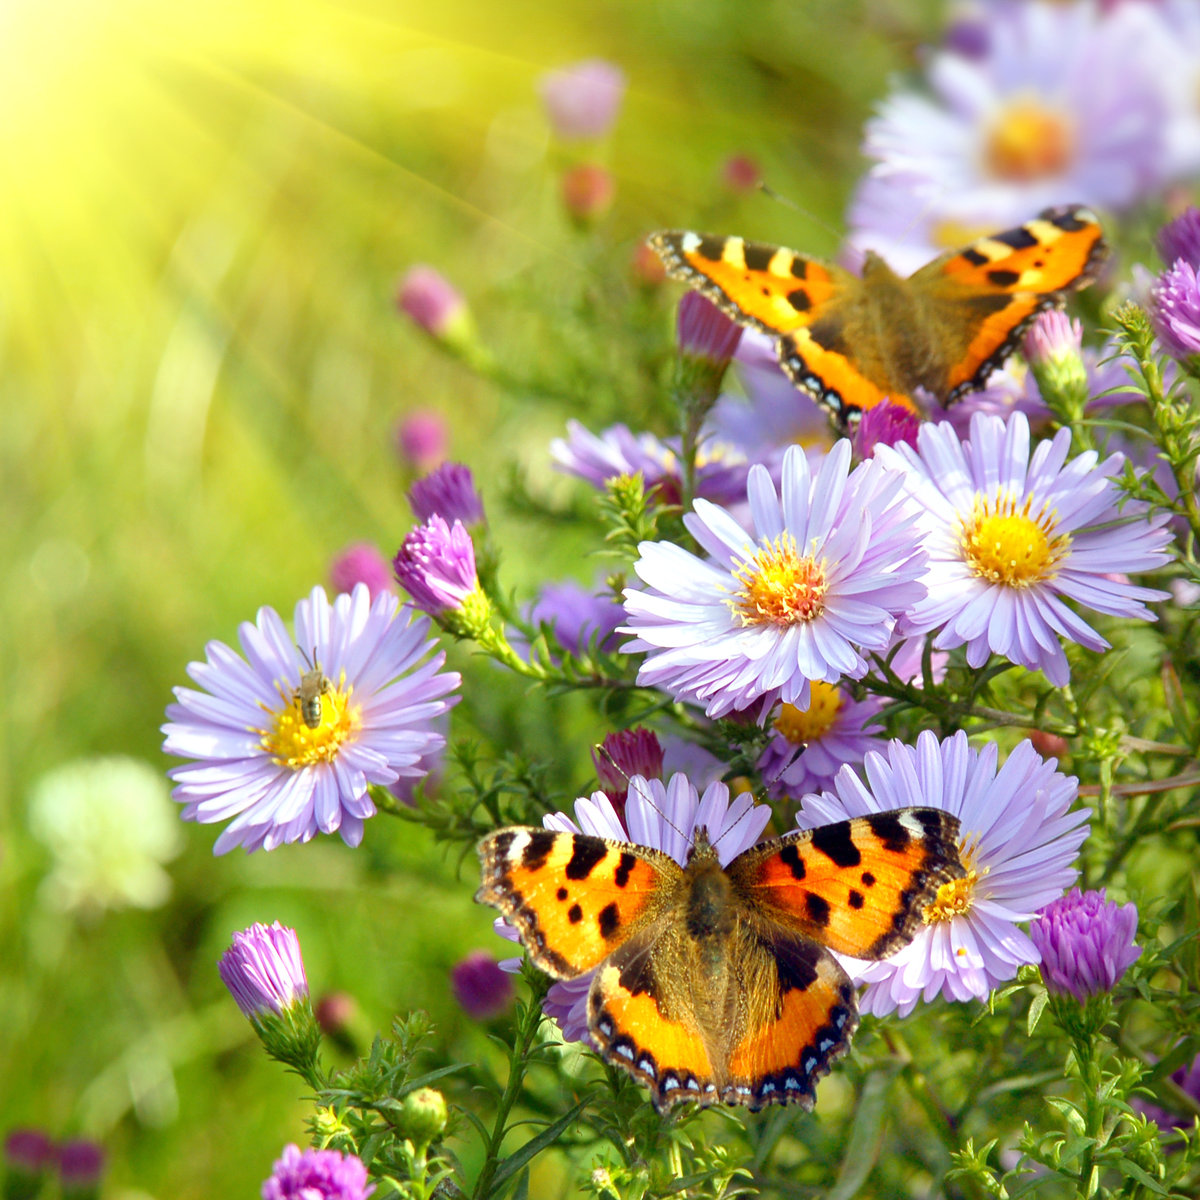 Бабушка дедушкой, лето картинки цветы бабочки